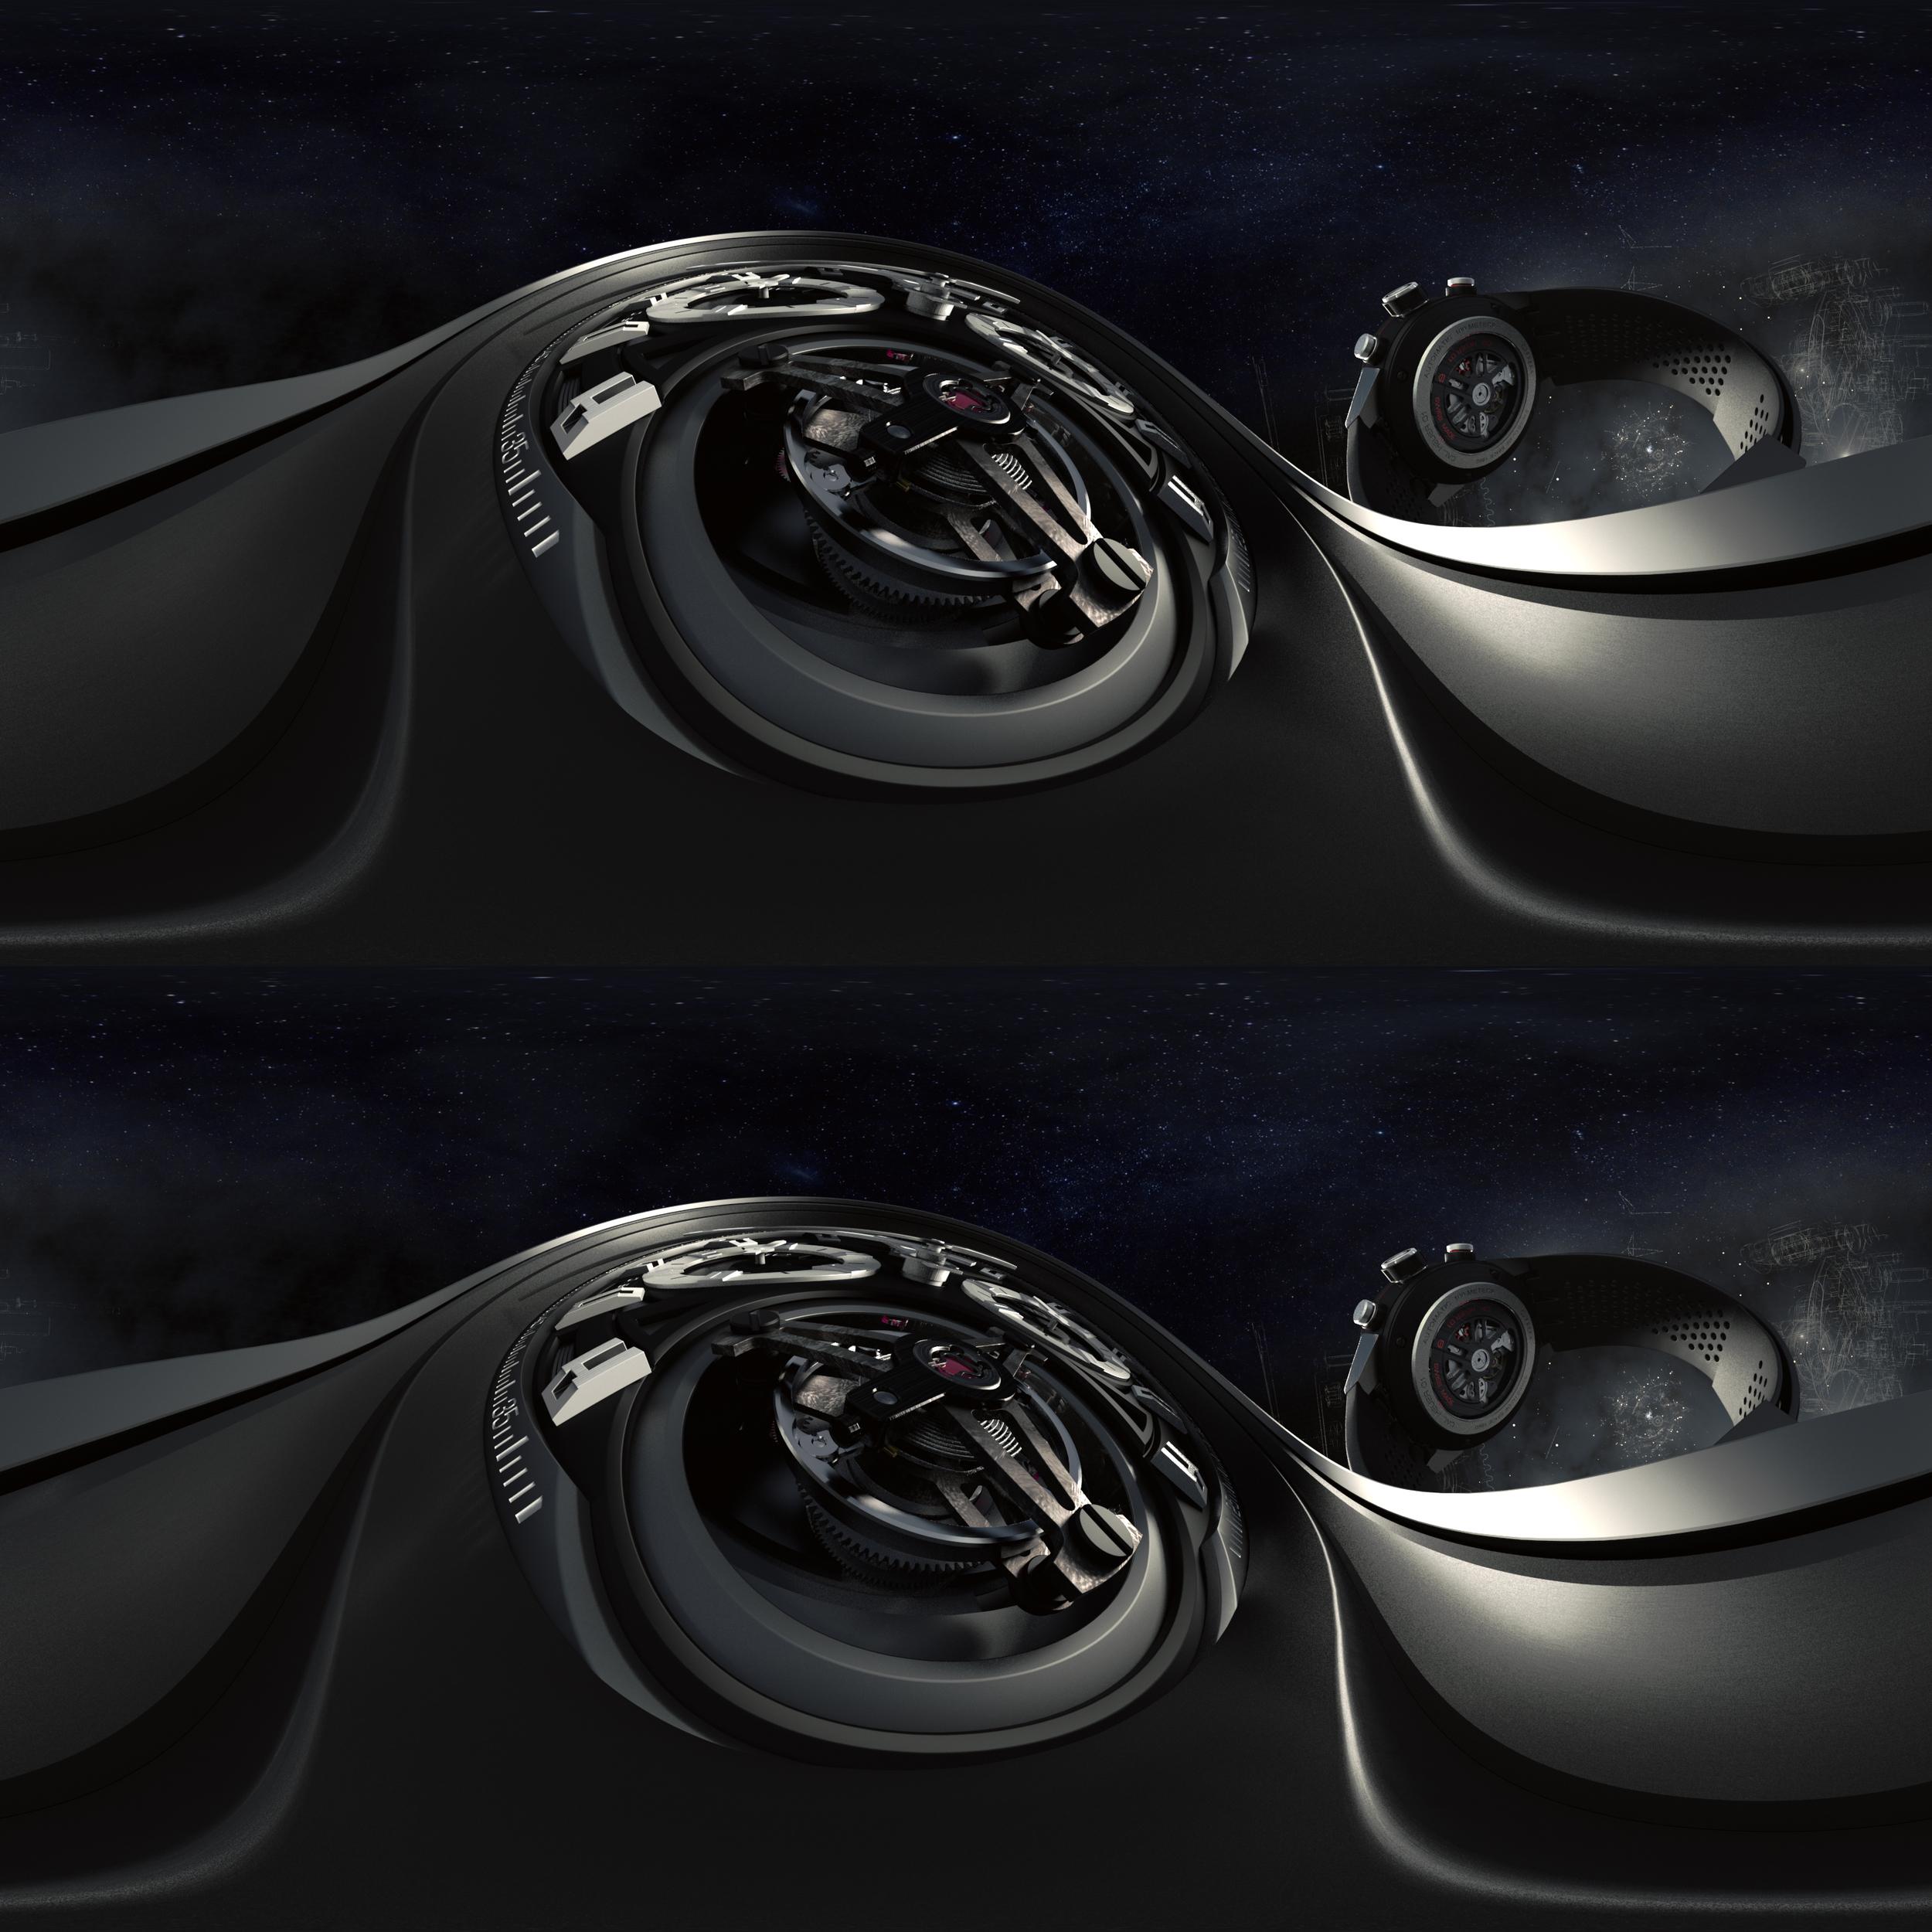 TH-VR_DemoStereo_09_TB.jpg